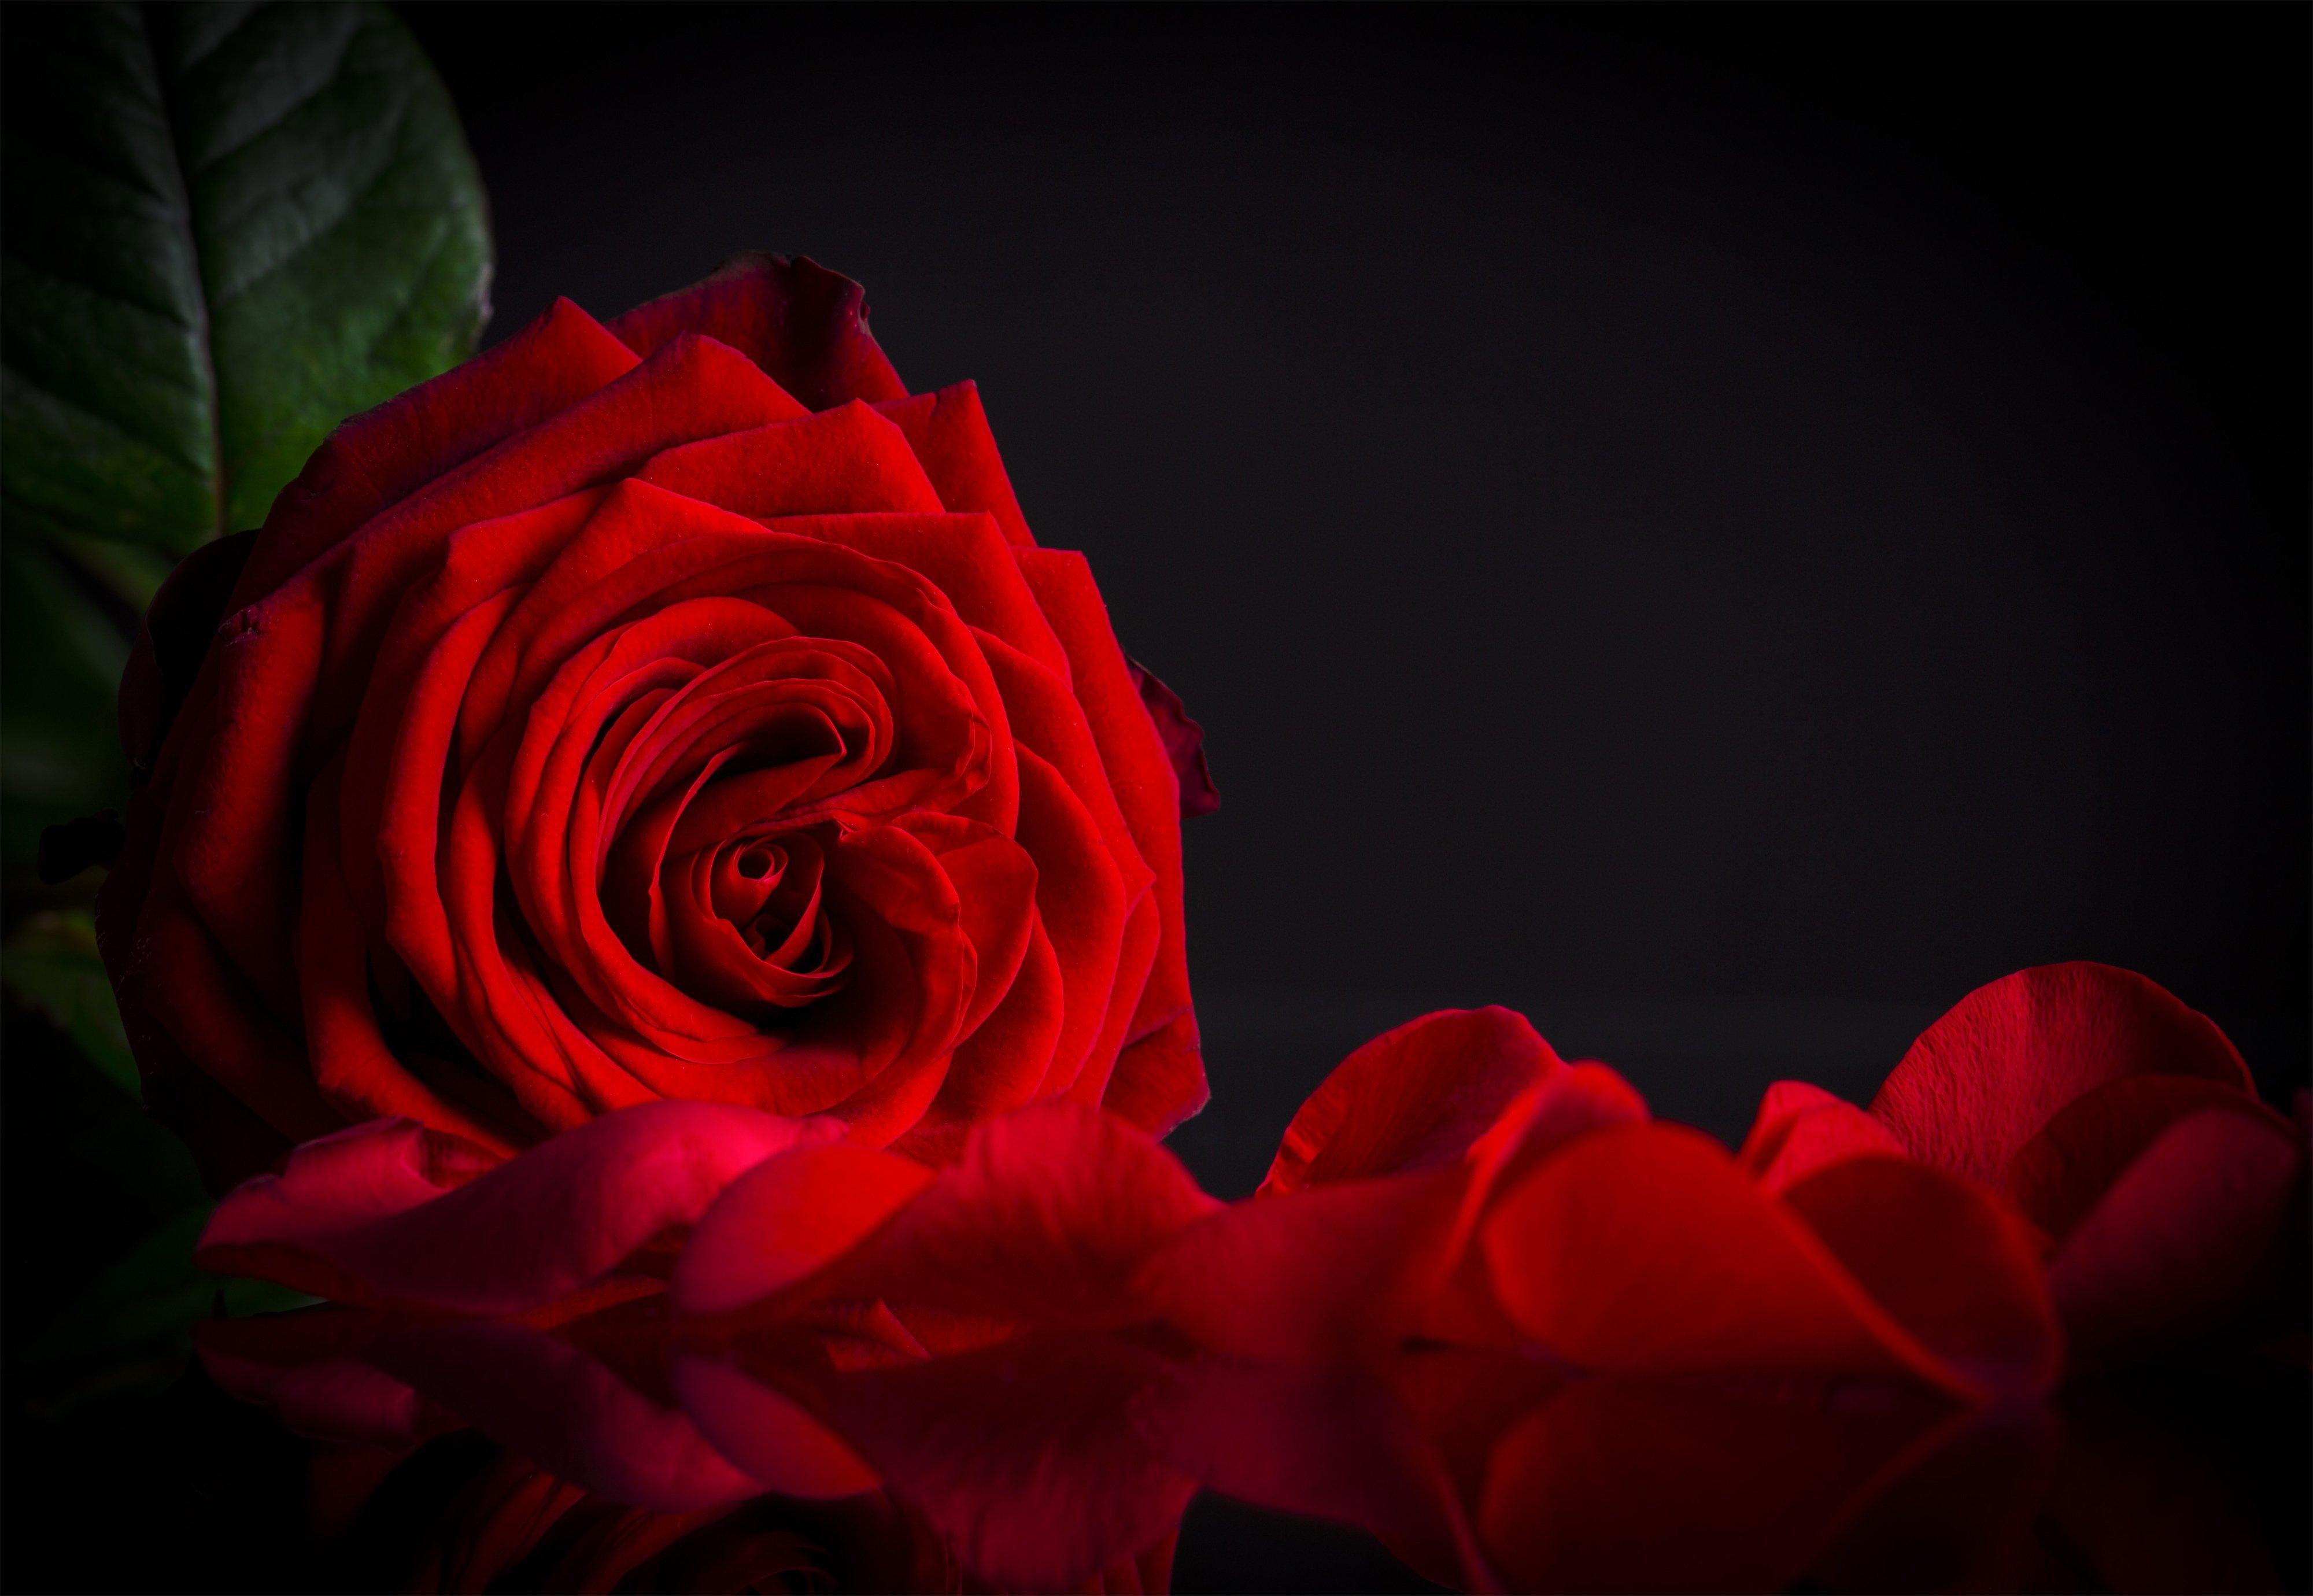 Red roses black background wallpapersafari - Black and red rose wallpaper ...